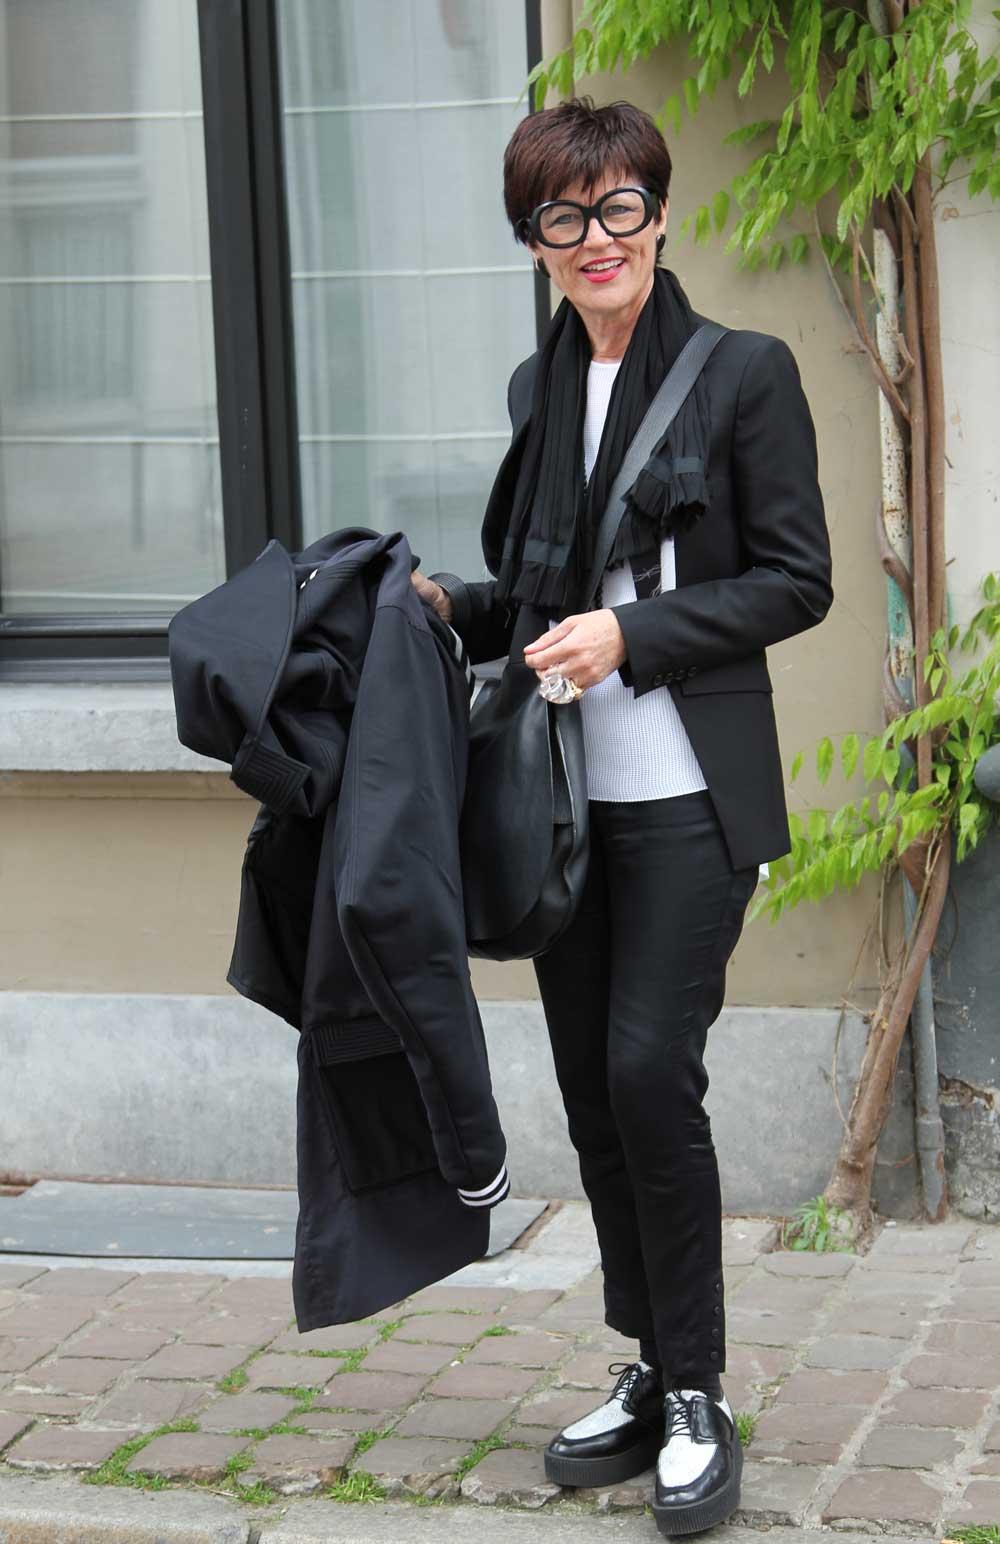 op straat in Antwerpen: Francine